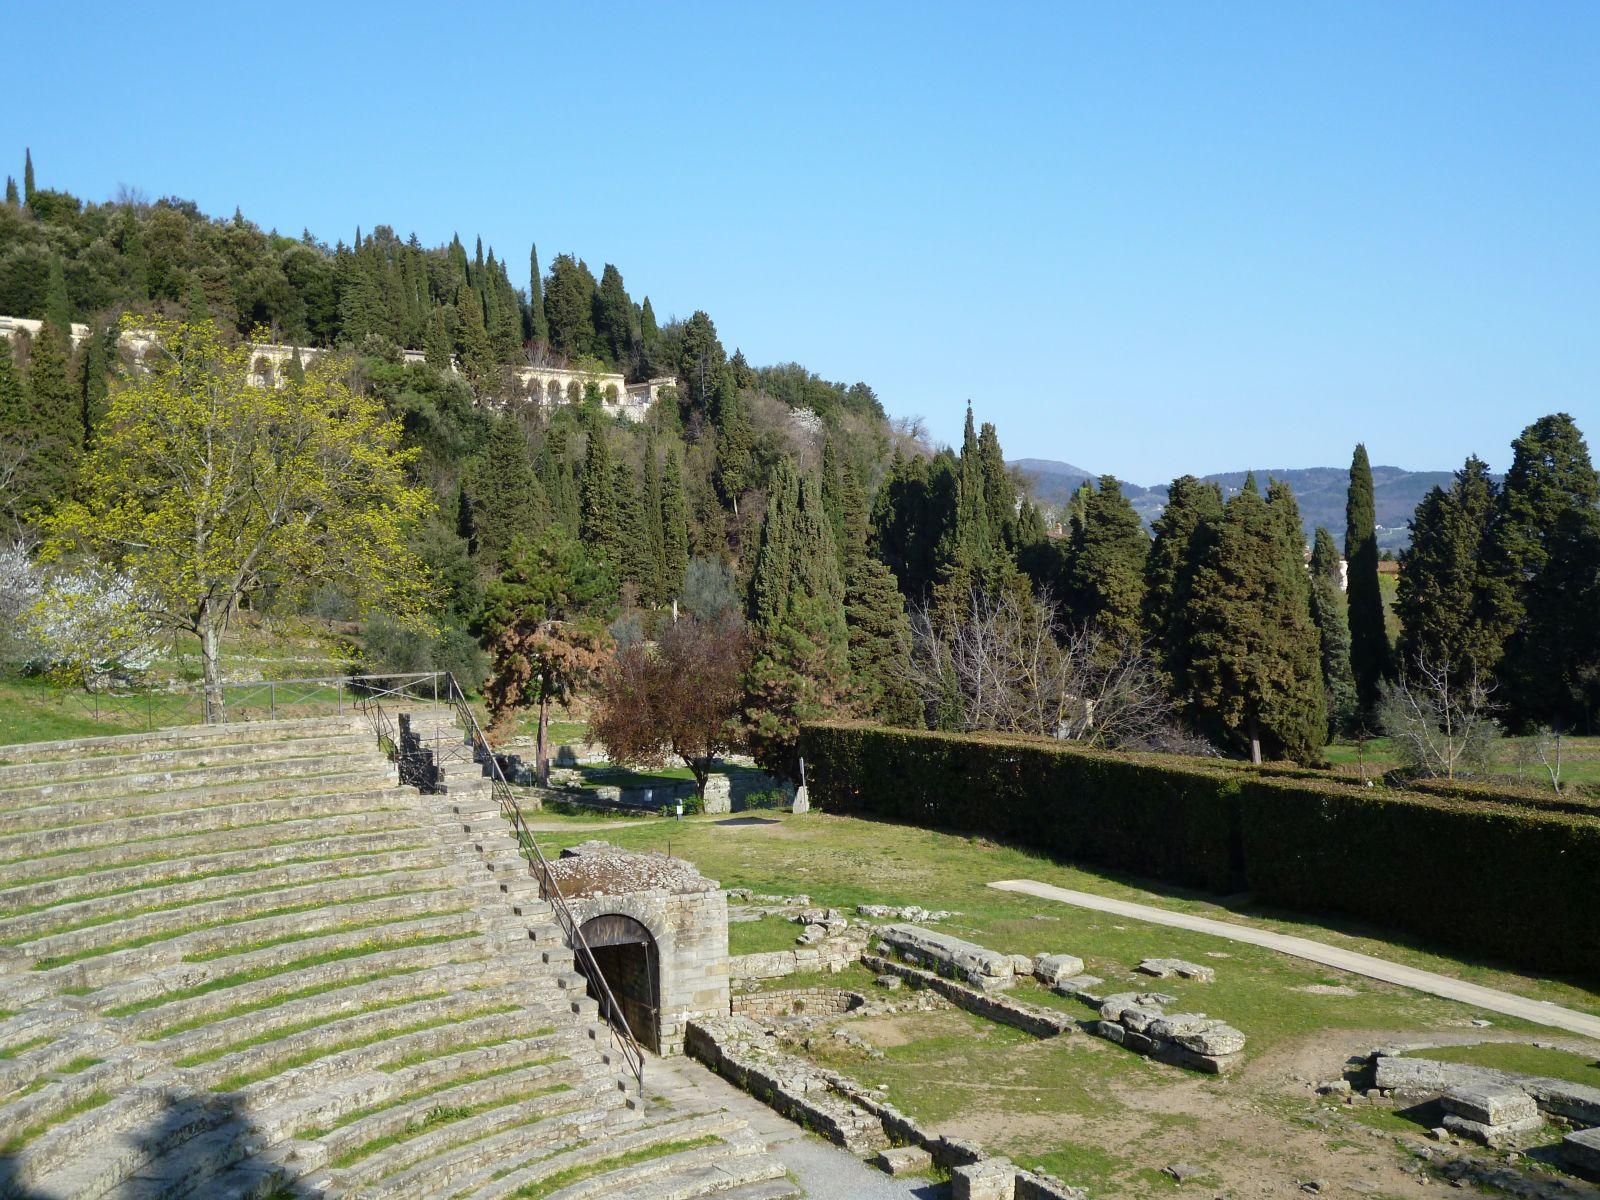 Fiesole - Fiesole, between stones and the sky - Tuscany, Beautiful Everywhere